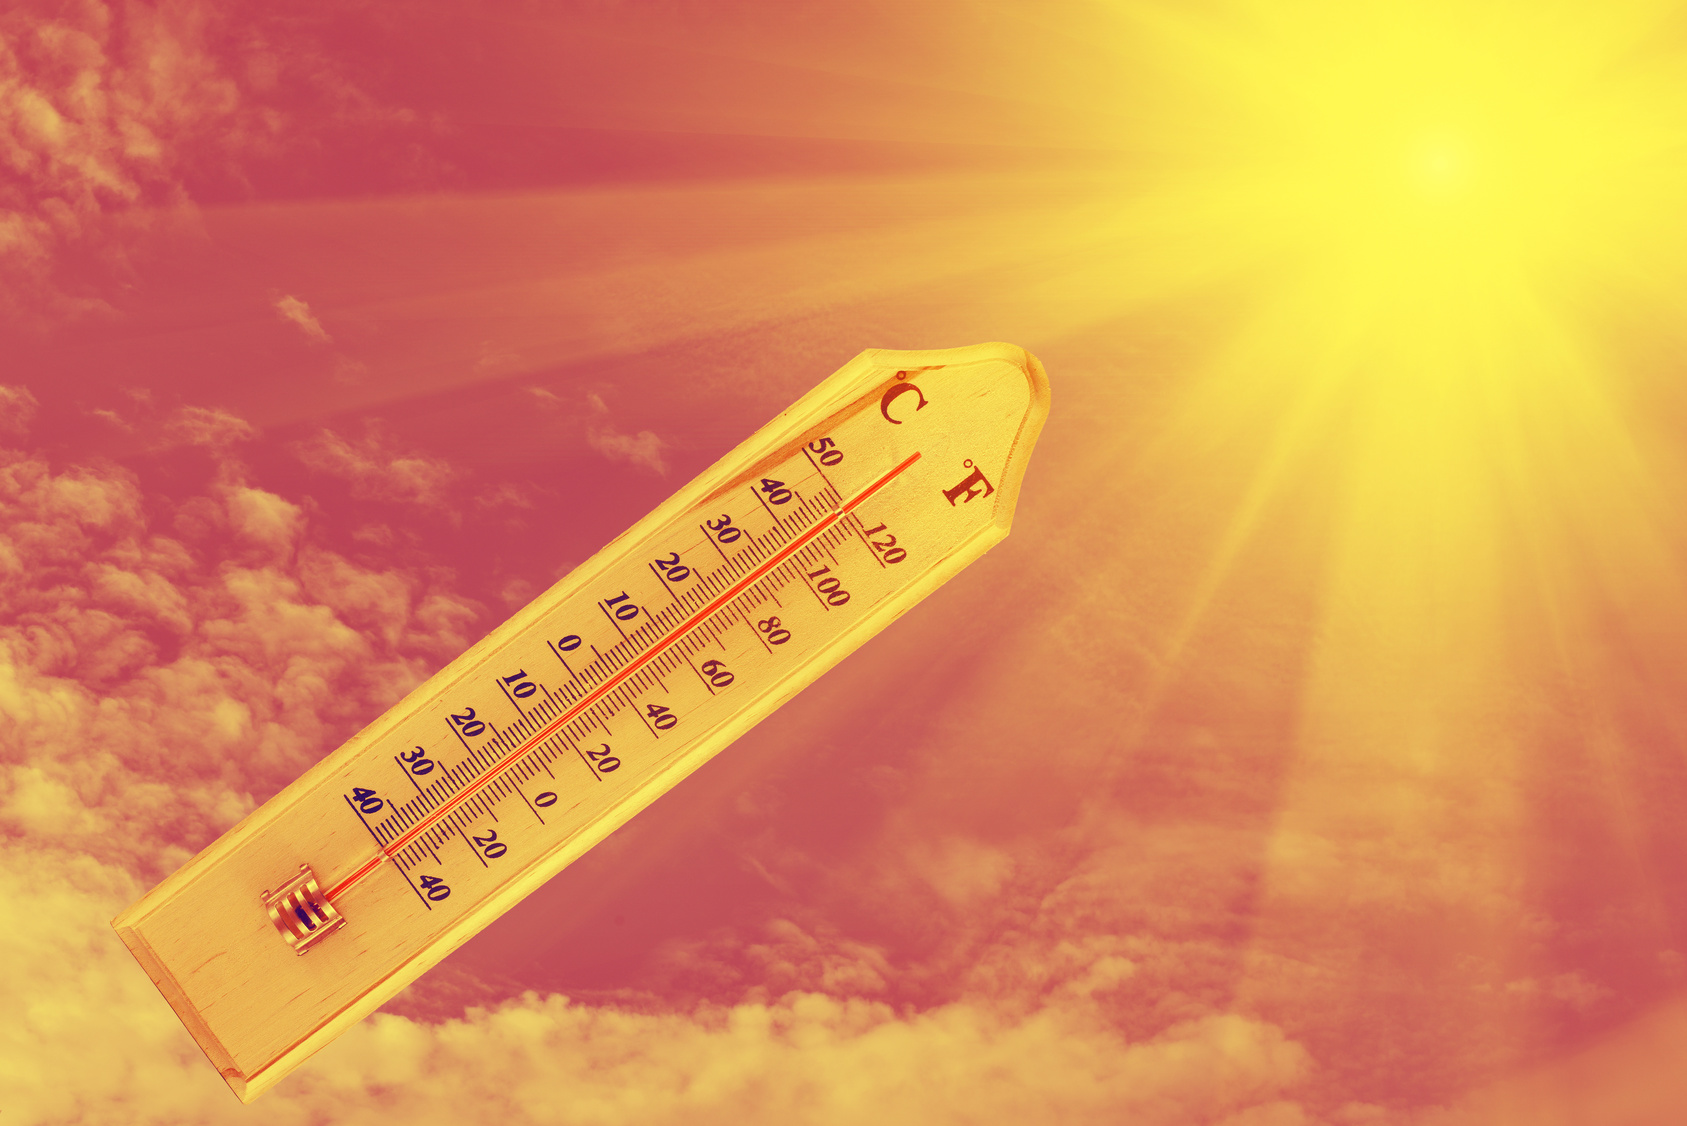 What's a heatwave?